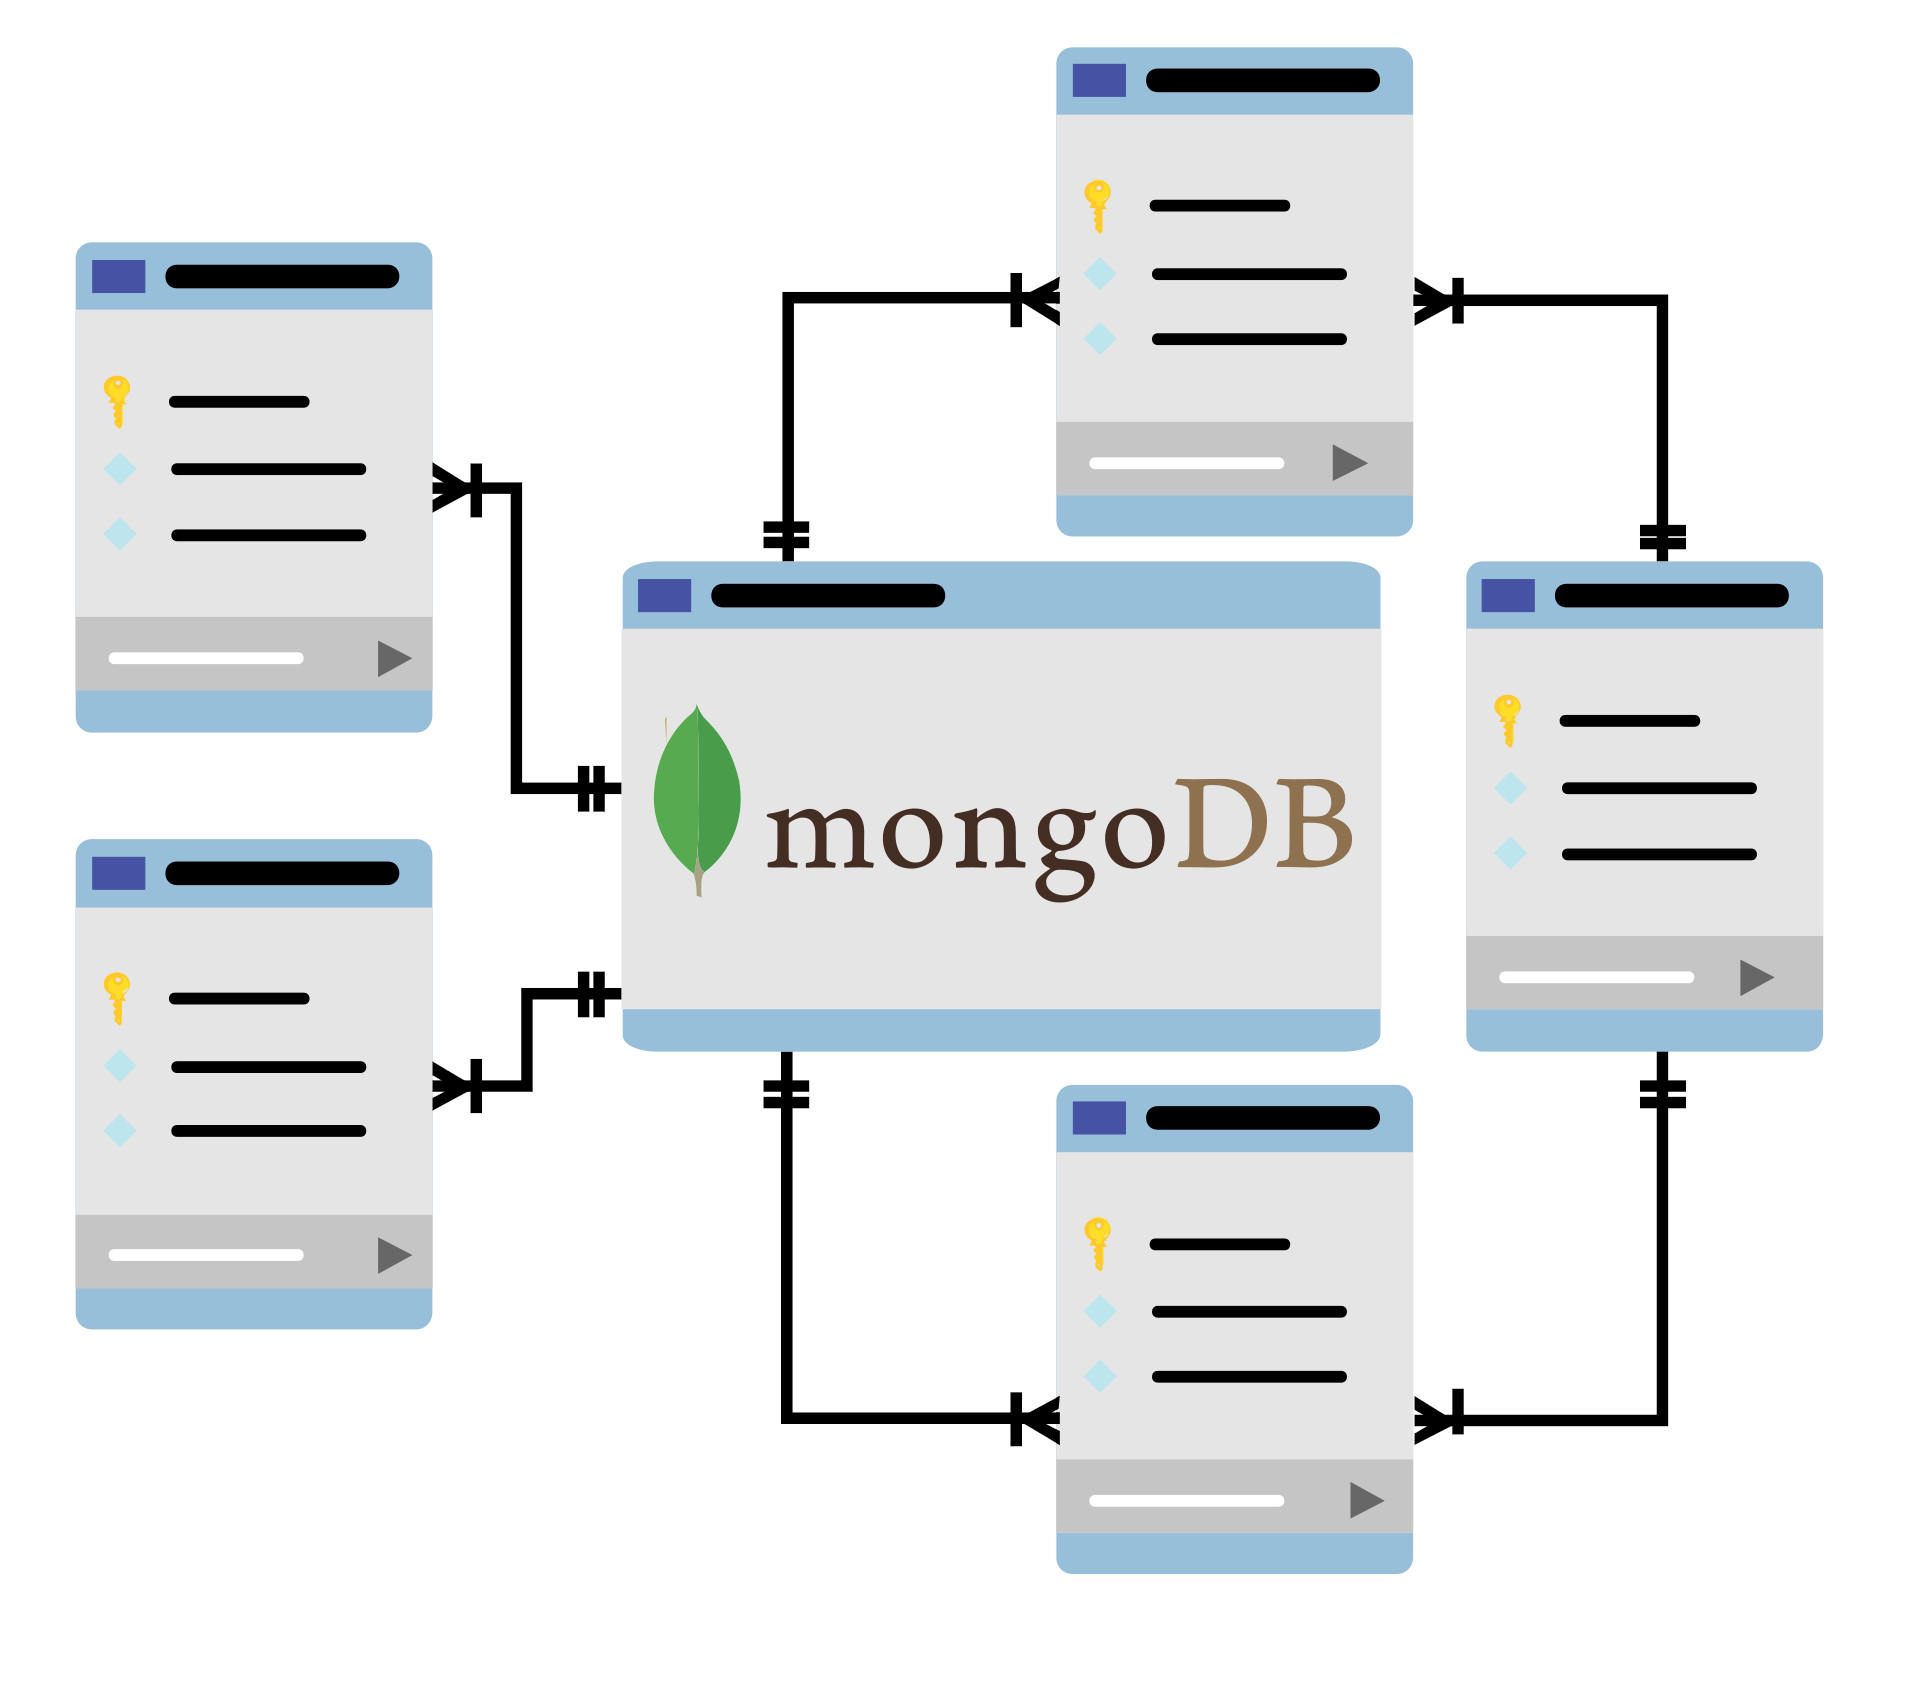 MongoDB Dokumente statt Daten